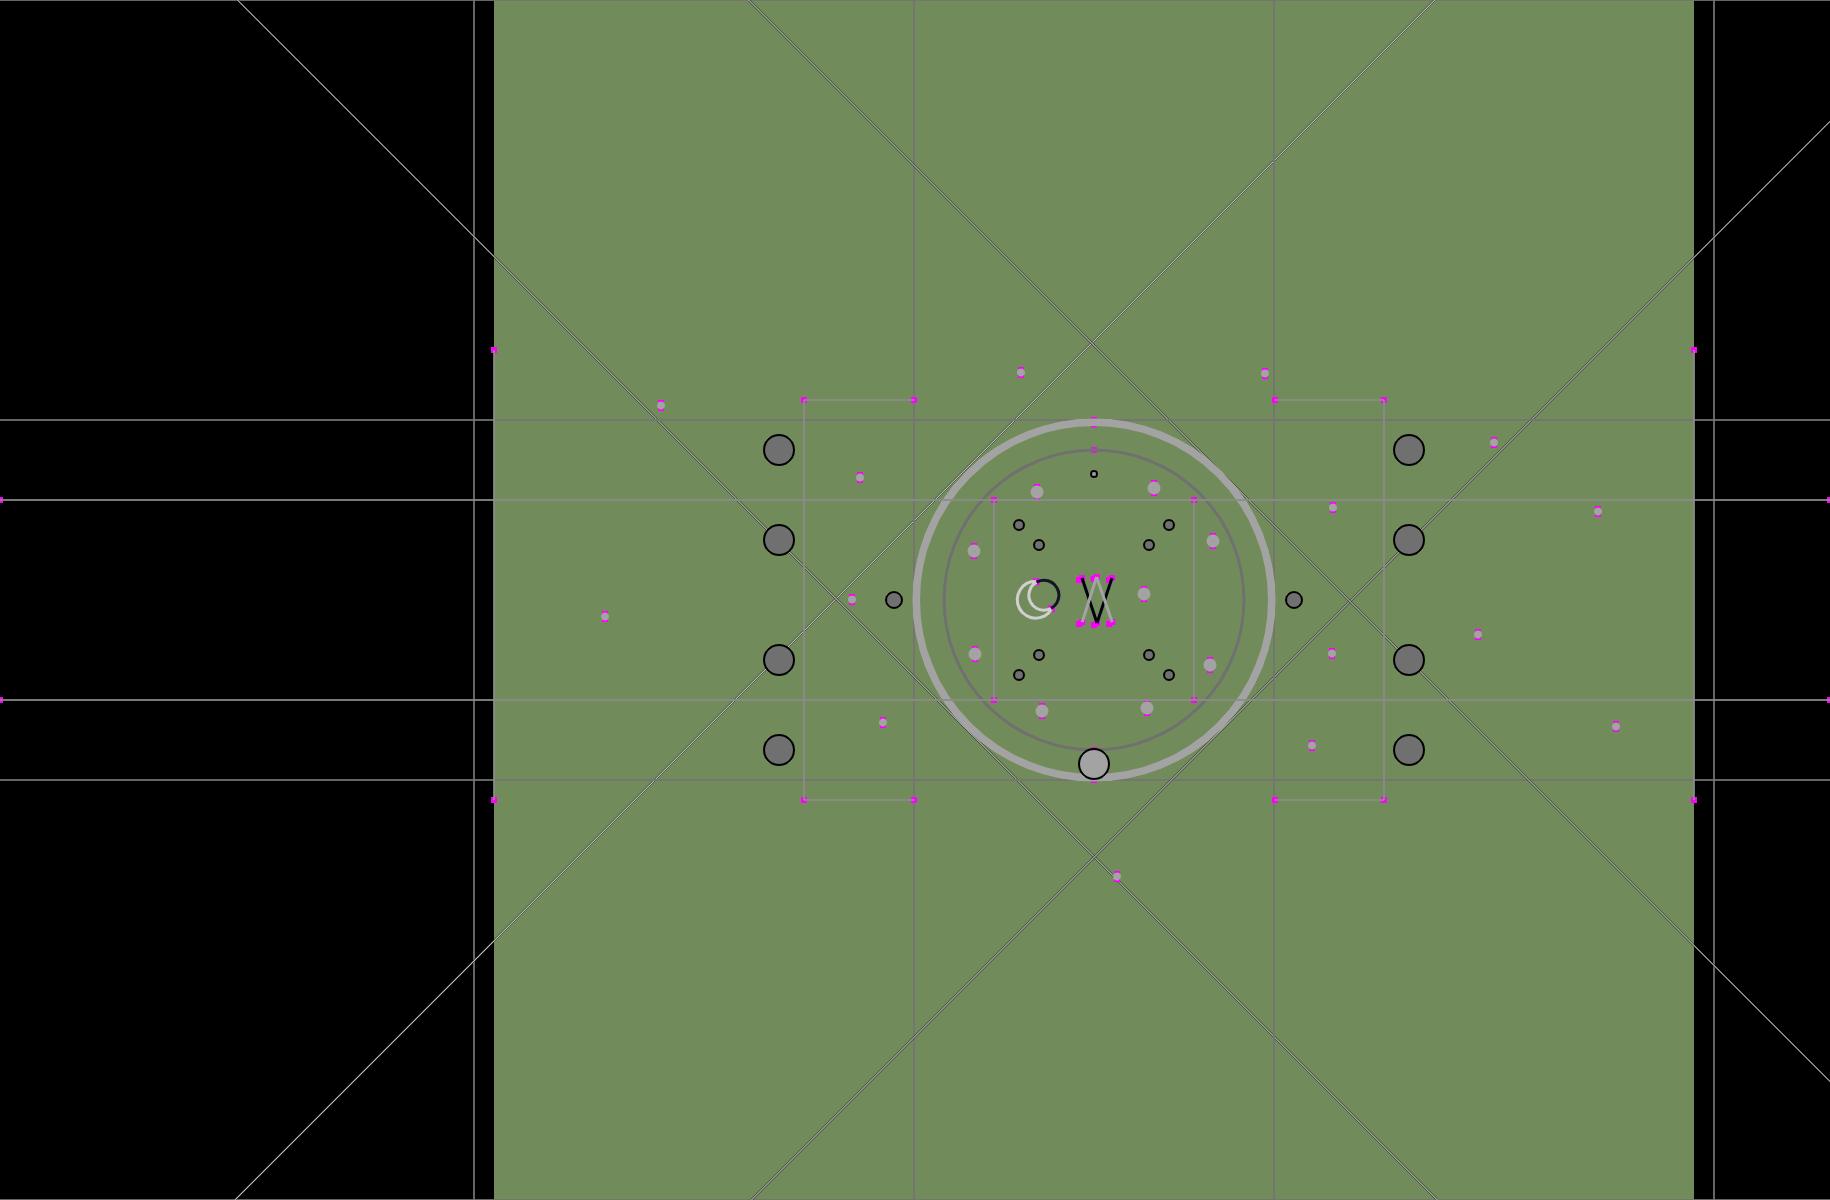 hax ball maps | Moonchair by valn v2